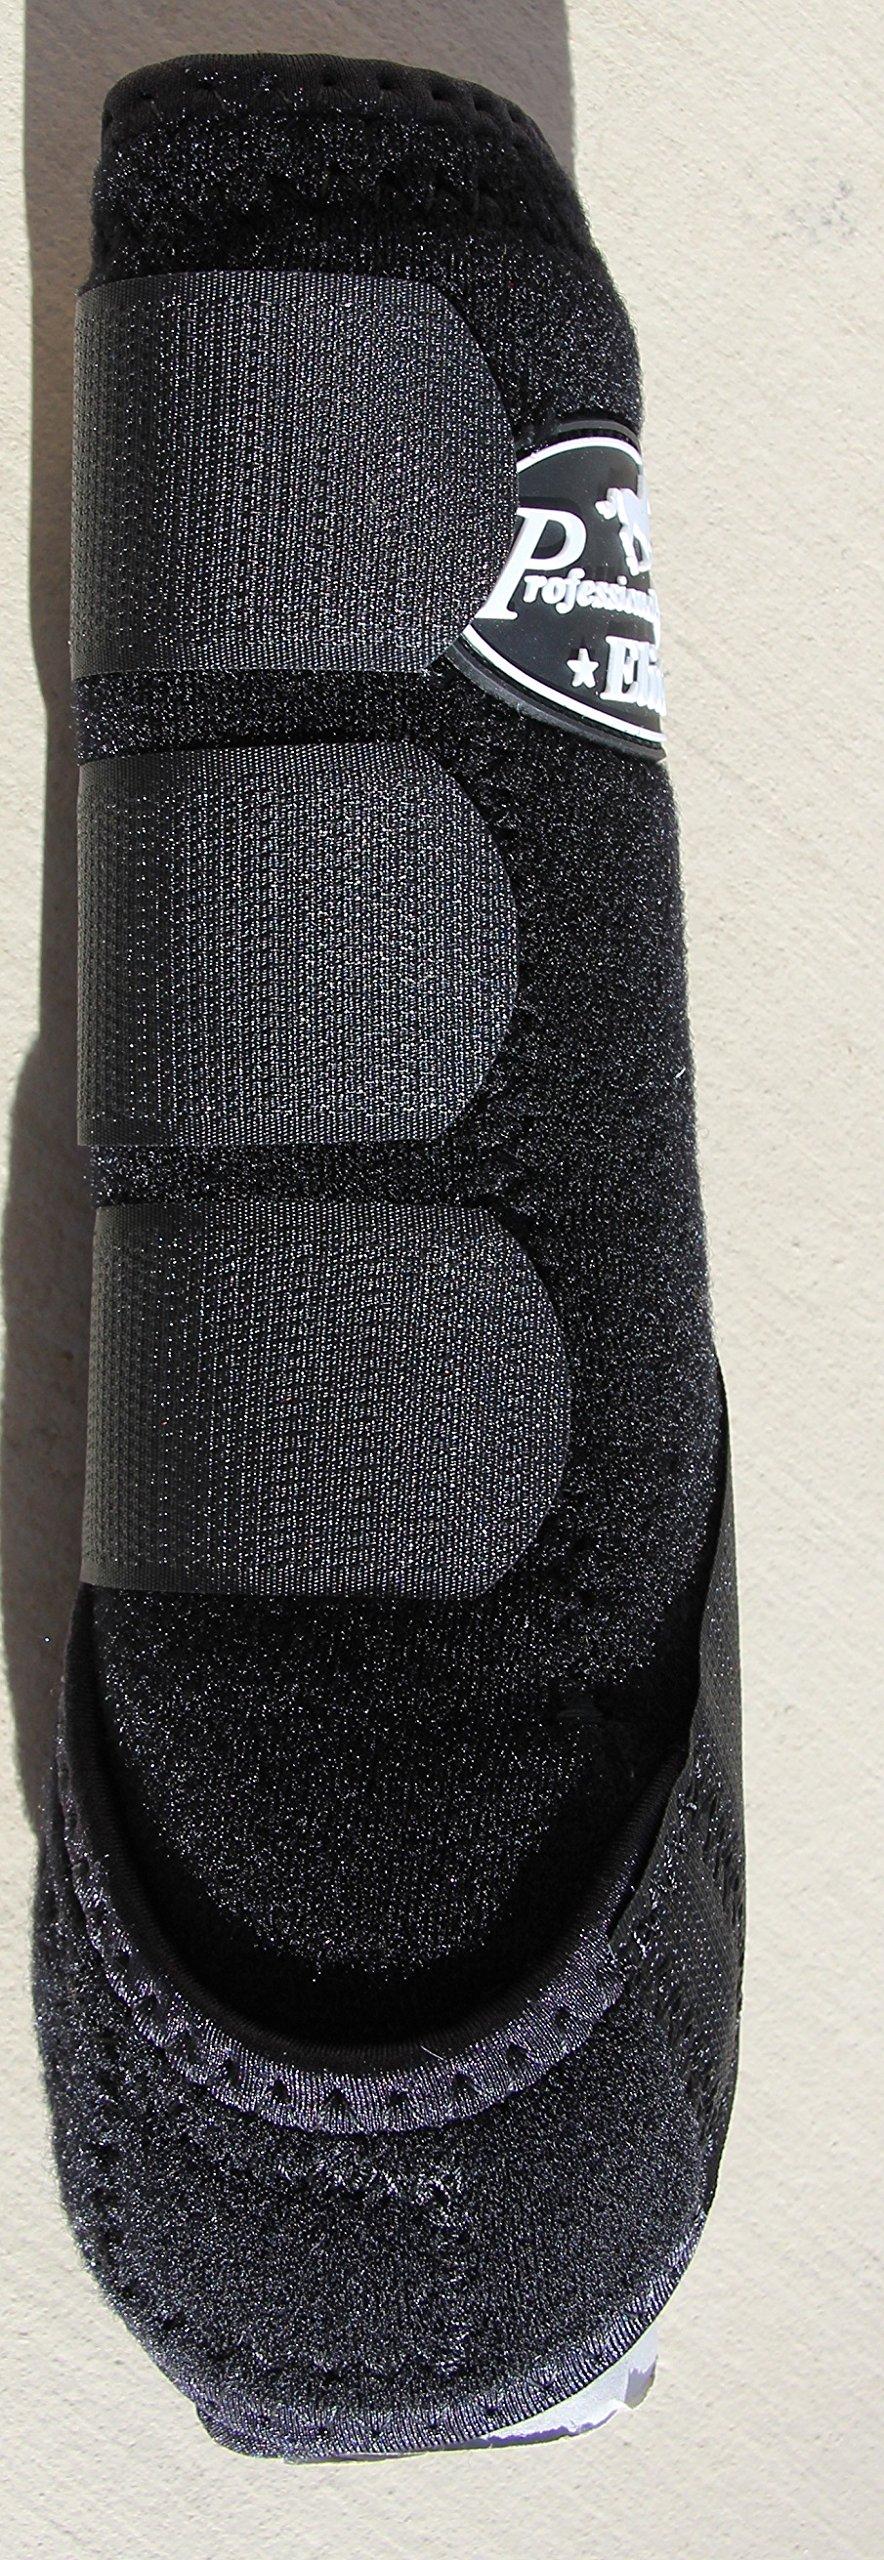 Professional's Choice ♦ VENTECH Elite Equine Sports Medicine Boots Set of 4 Colors (Black, Medium) by Professional's Choice (Image #3)